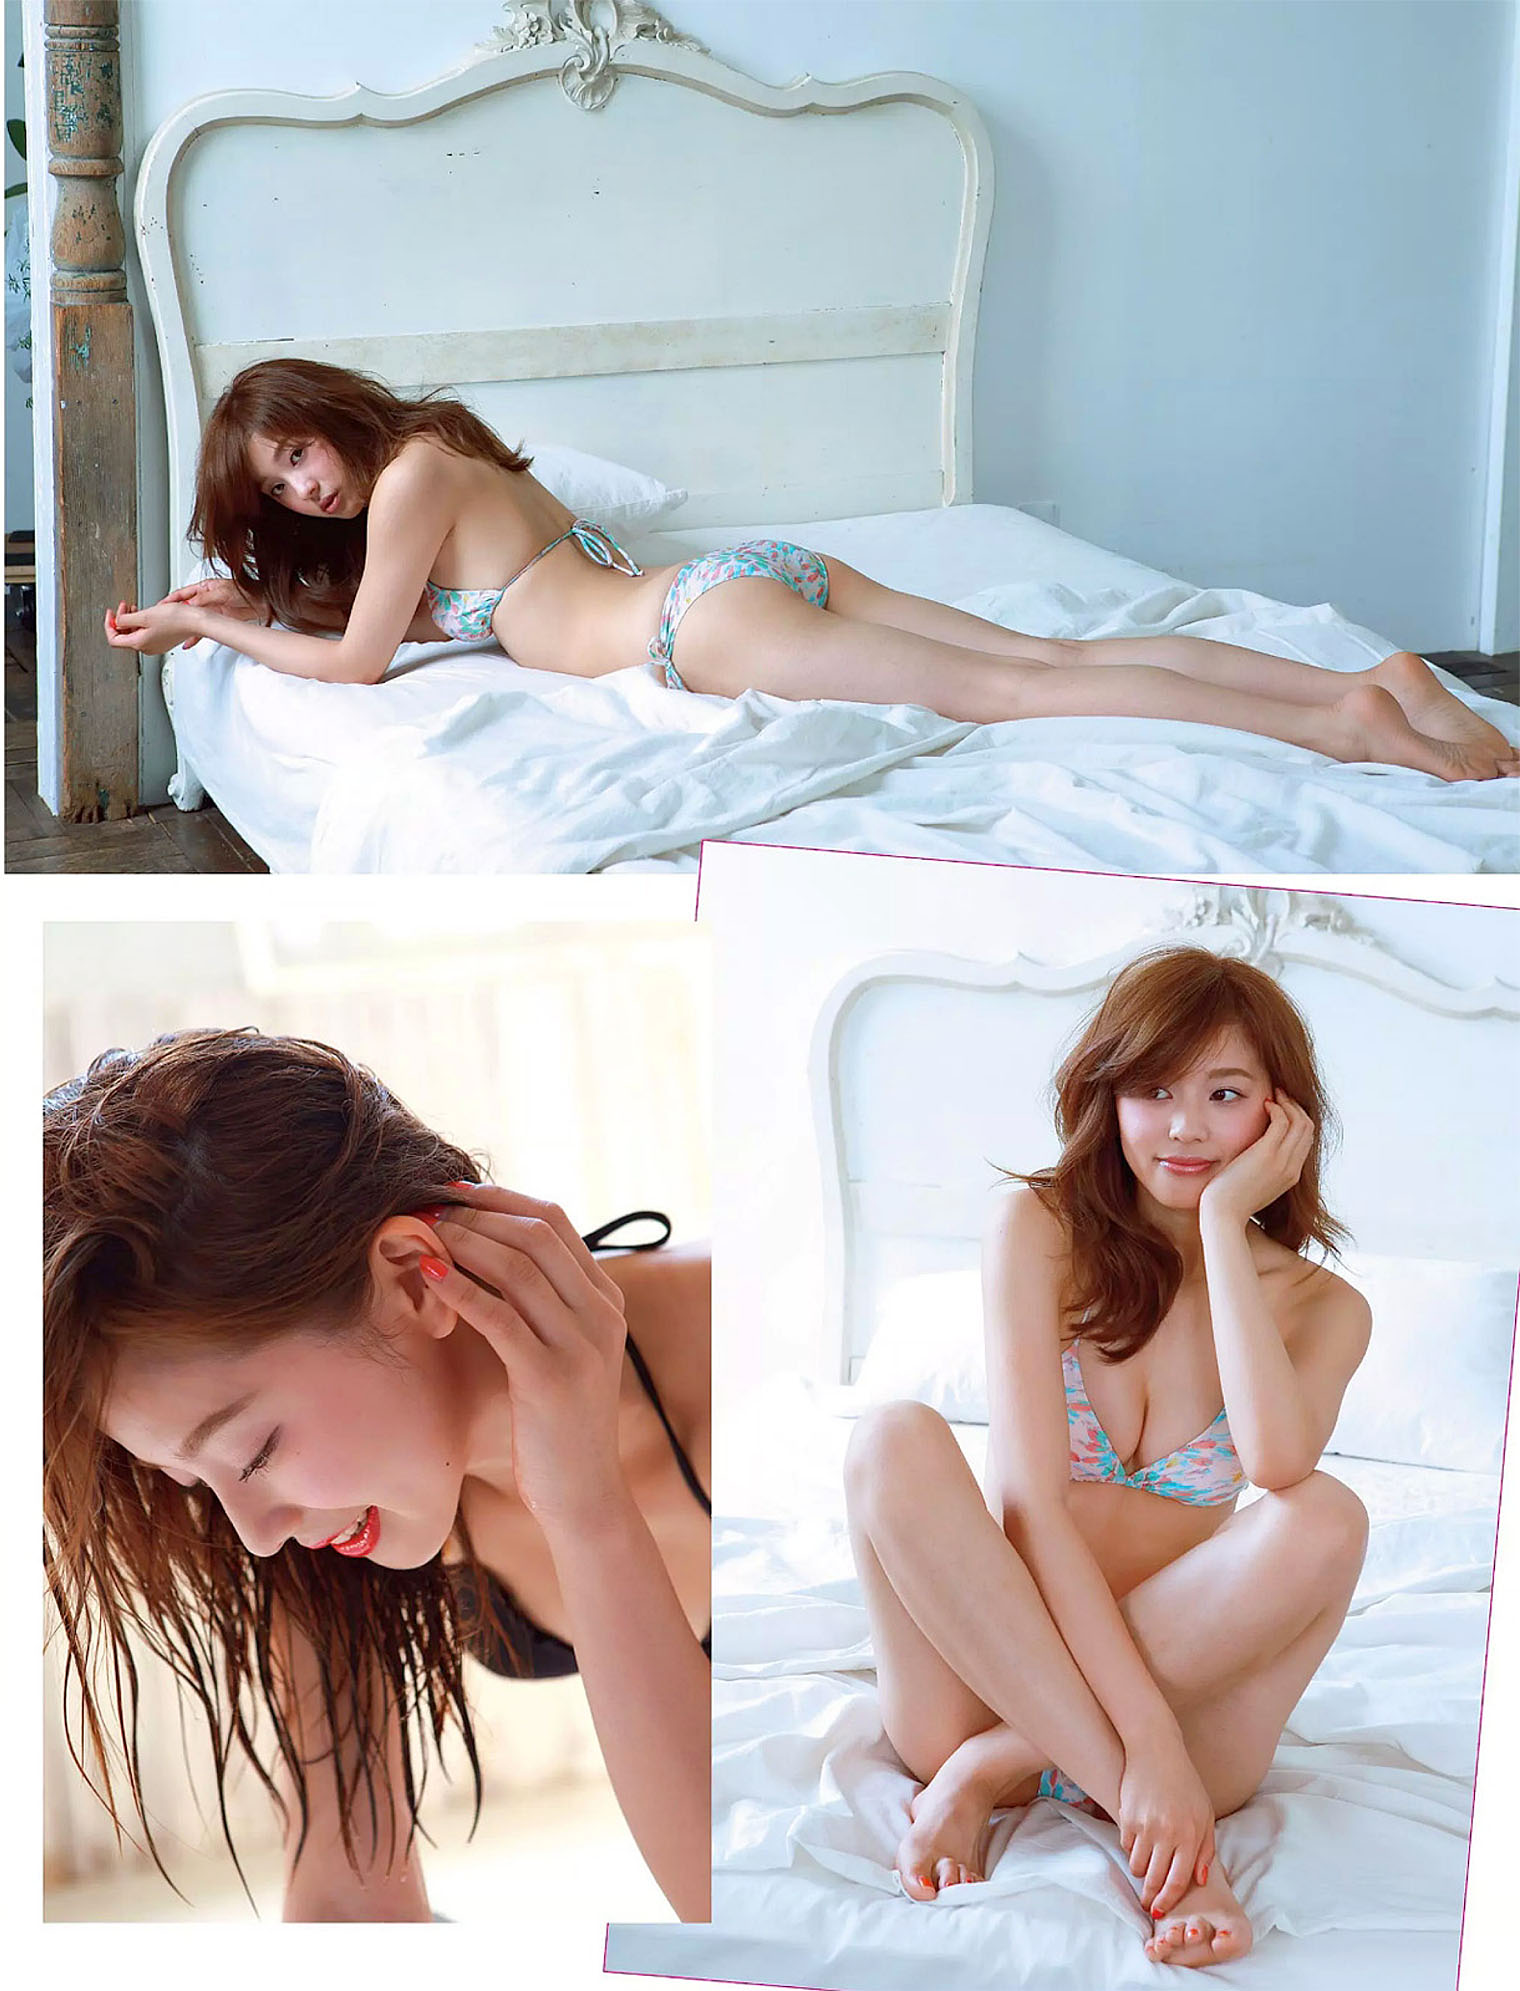 Aya Asahina Flash 150609 03.jpg